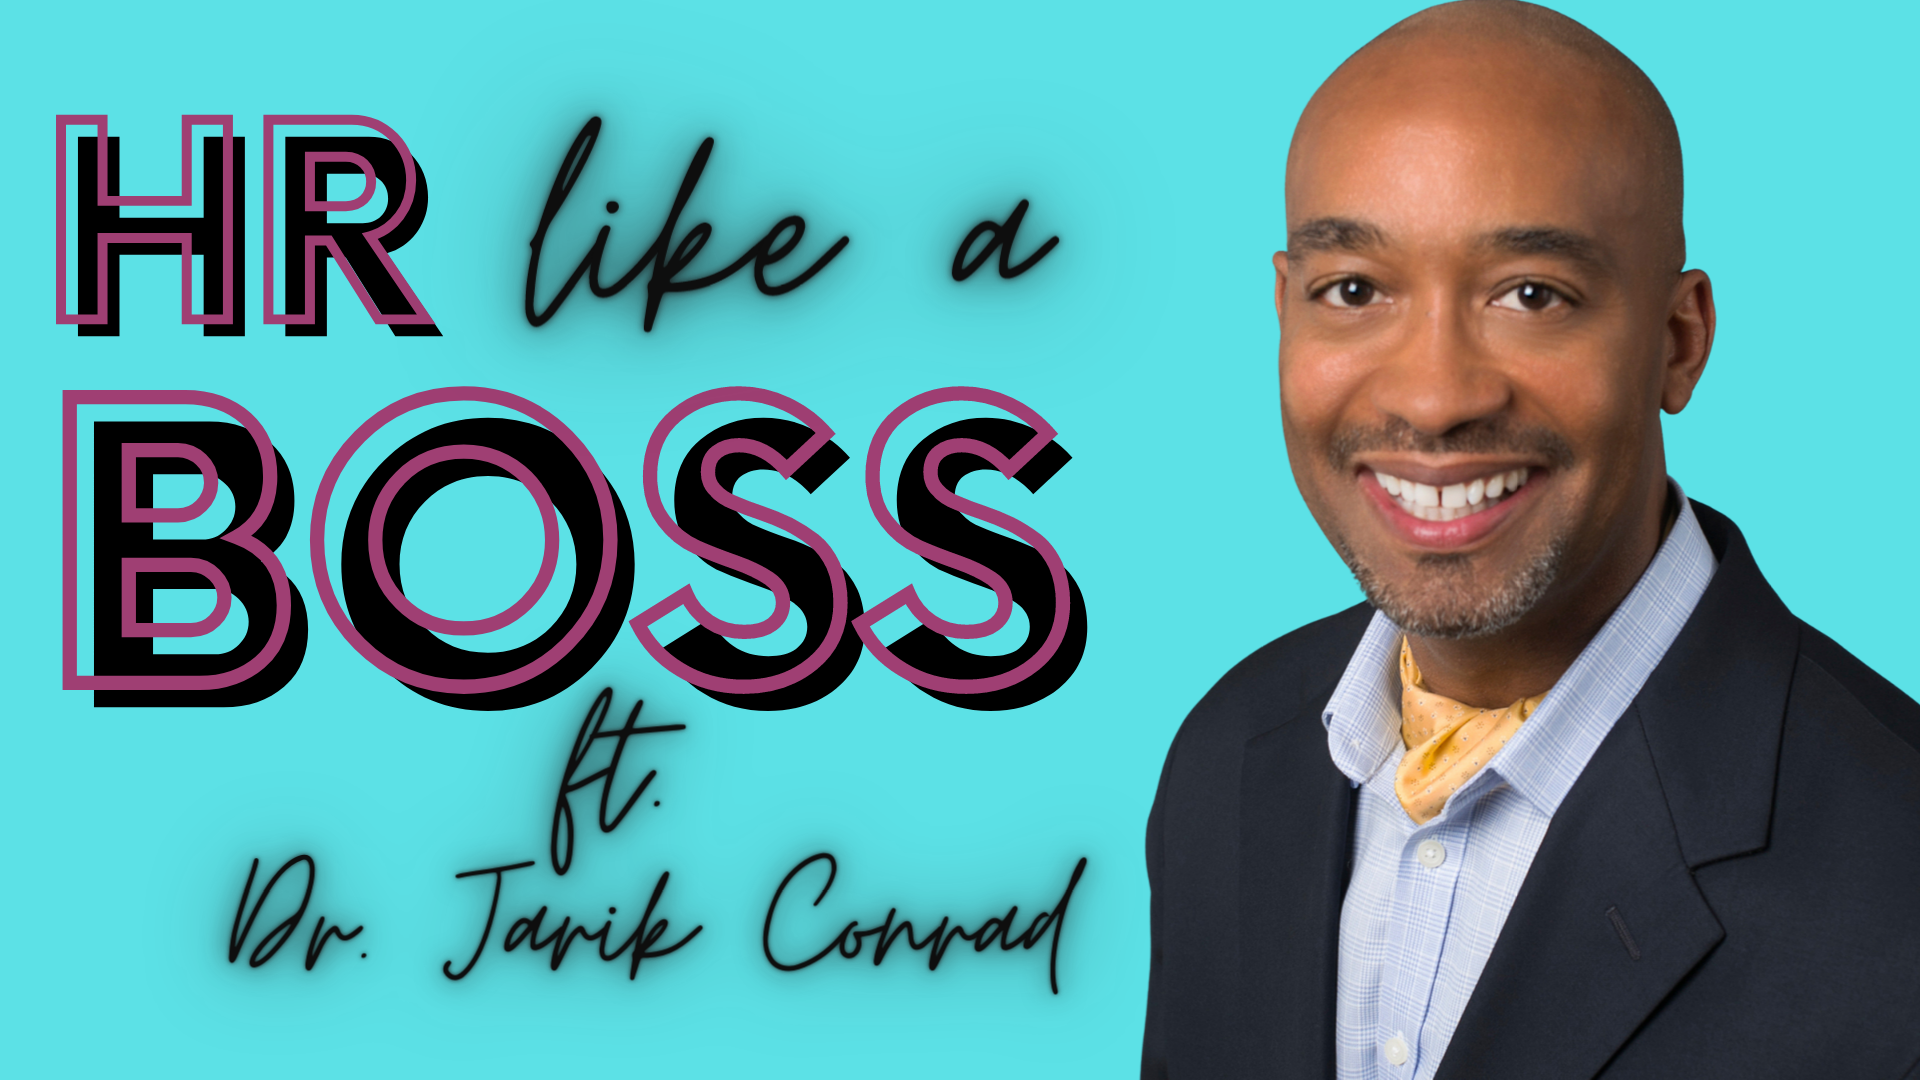 HR Like a Boss with Dr. Jarik Conrad